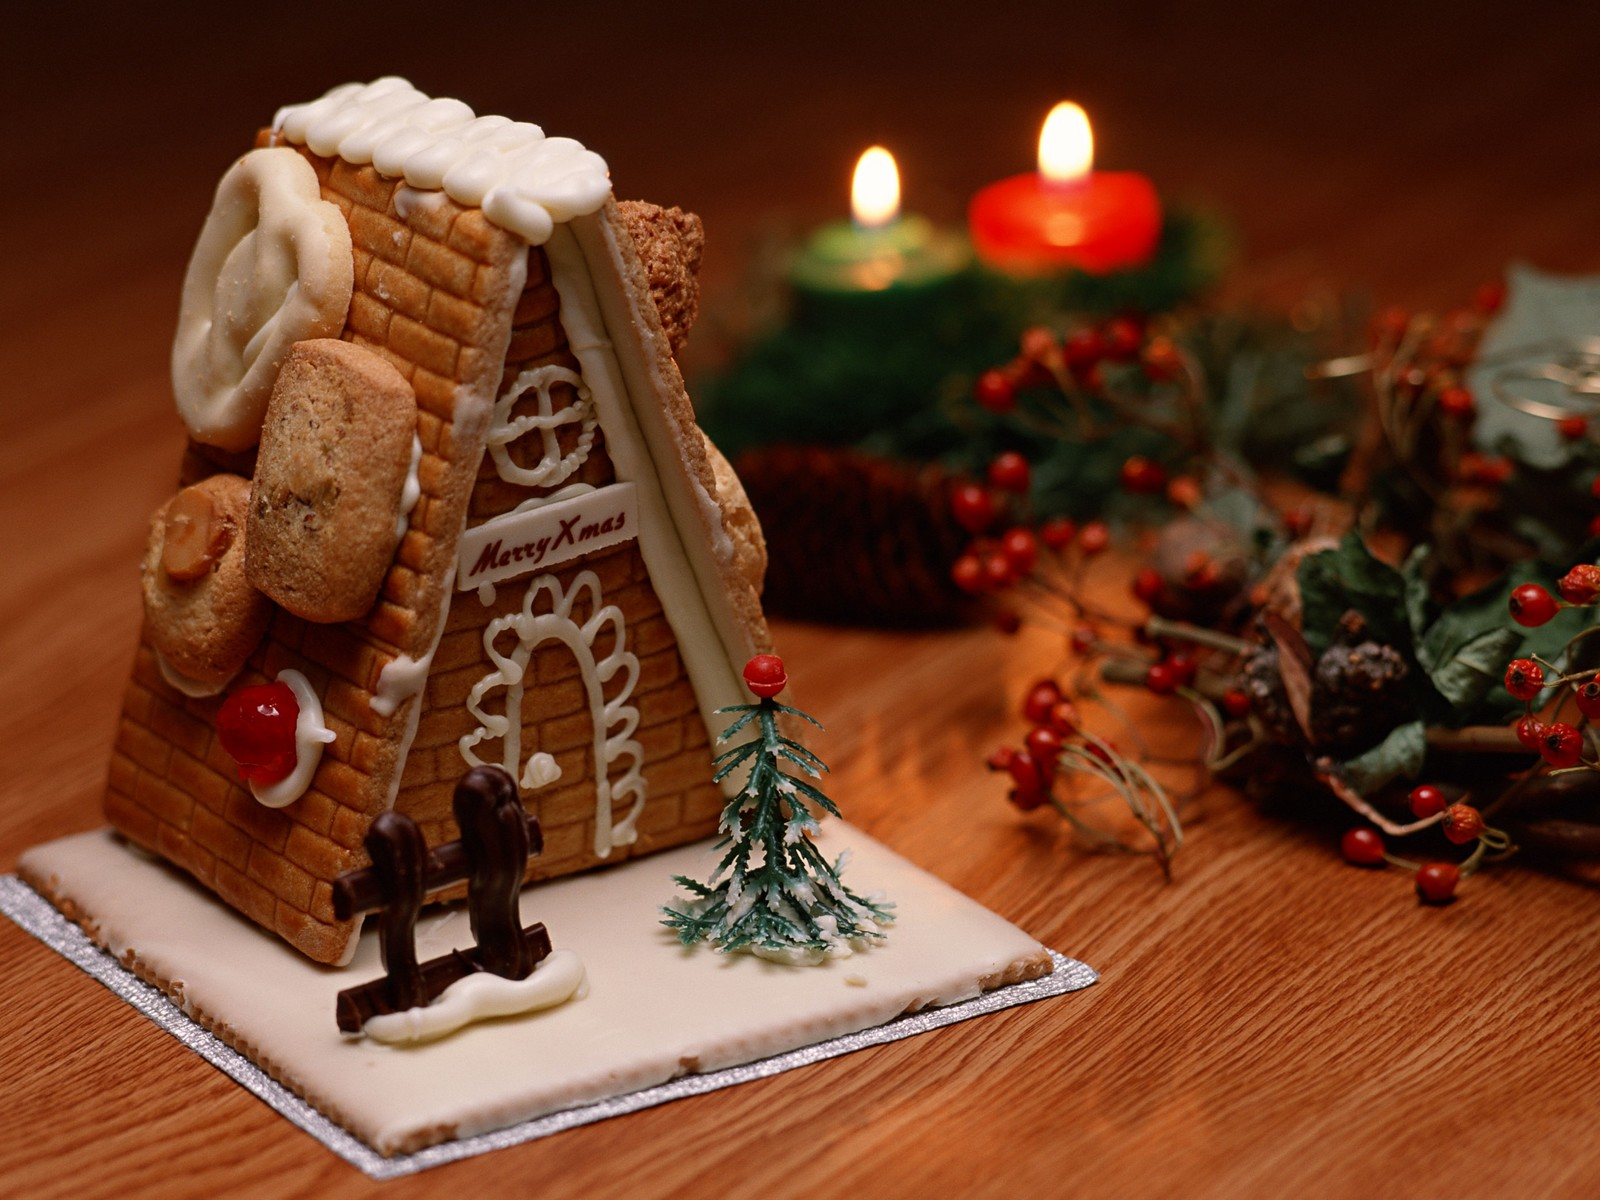 Merry-Xmas-Candie-554812.jpeg